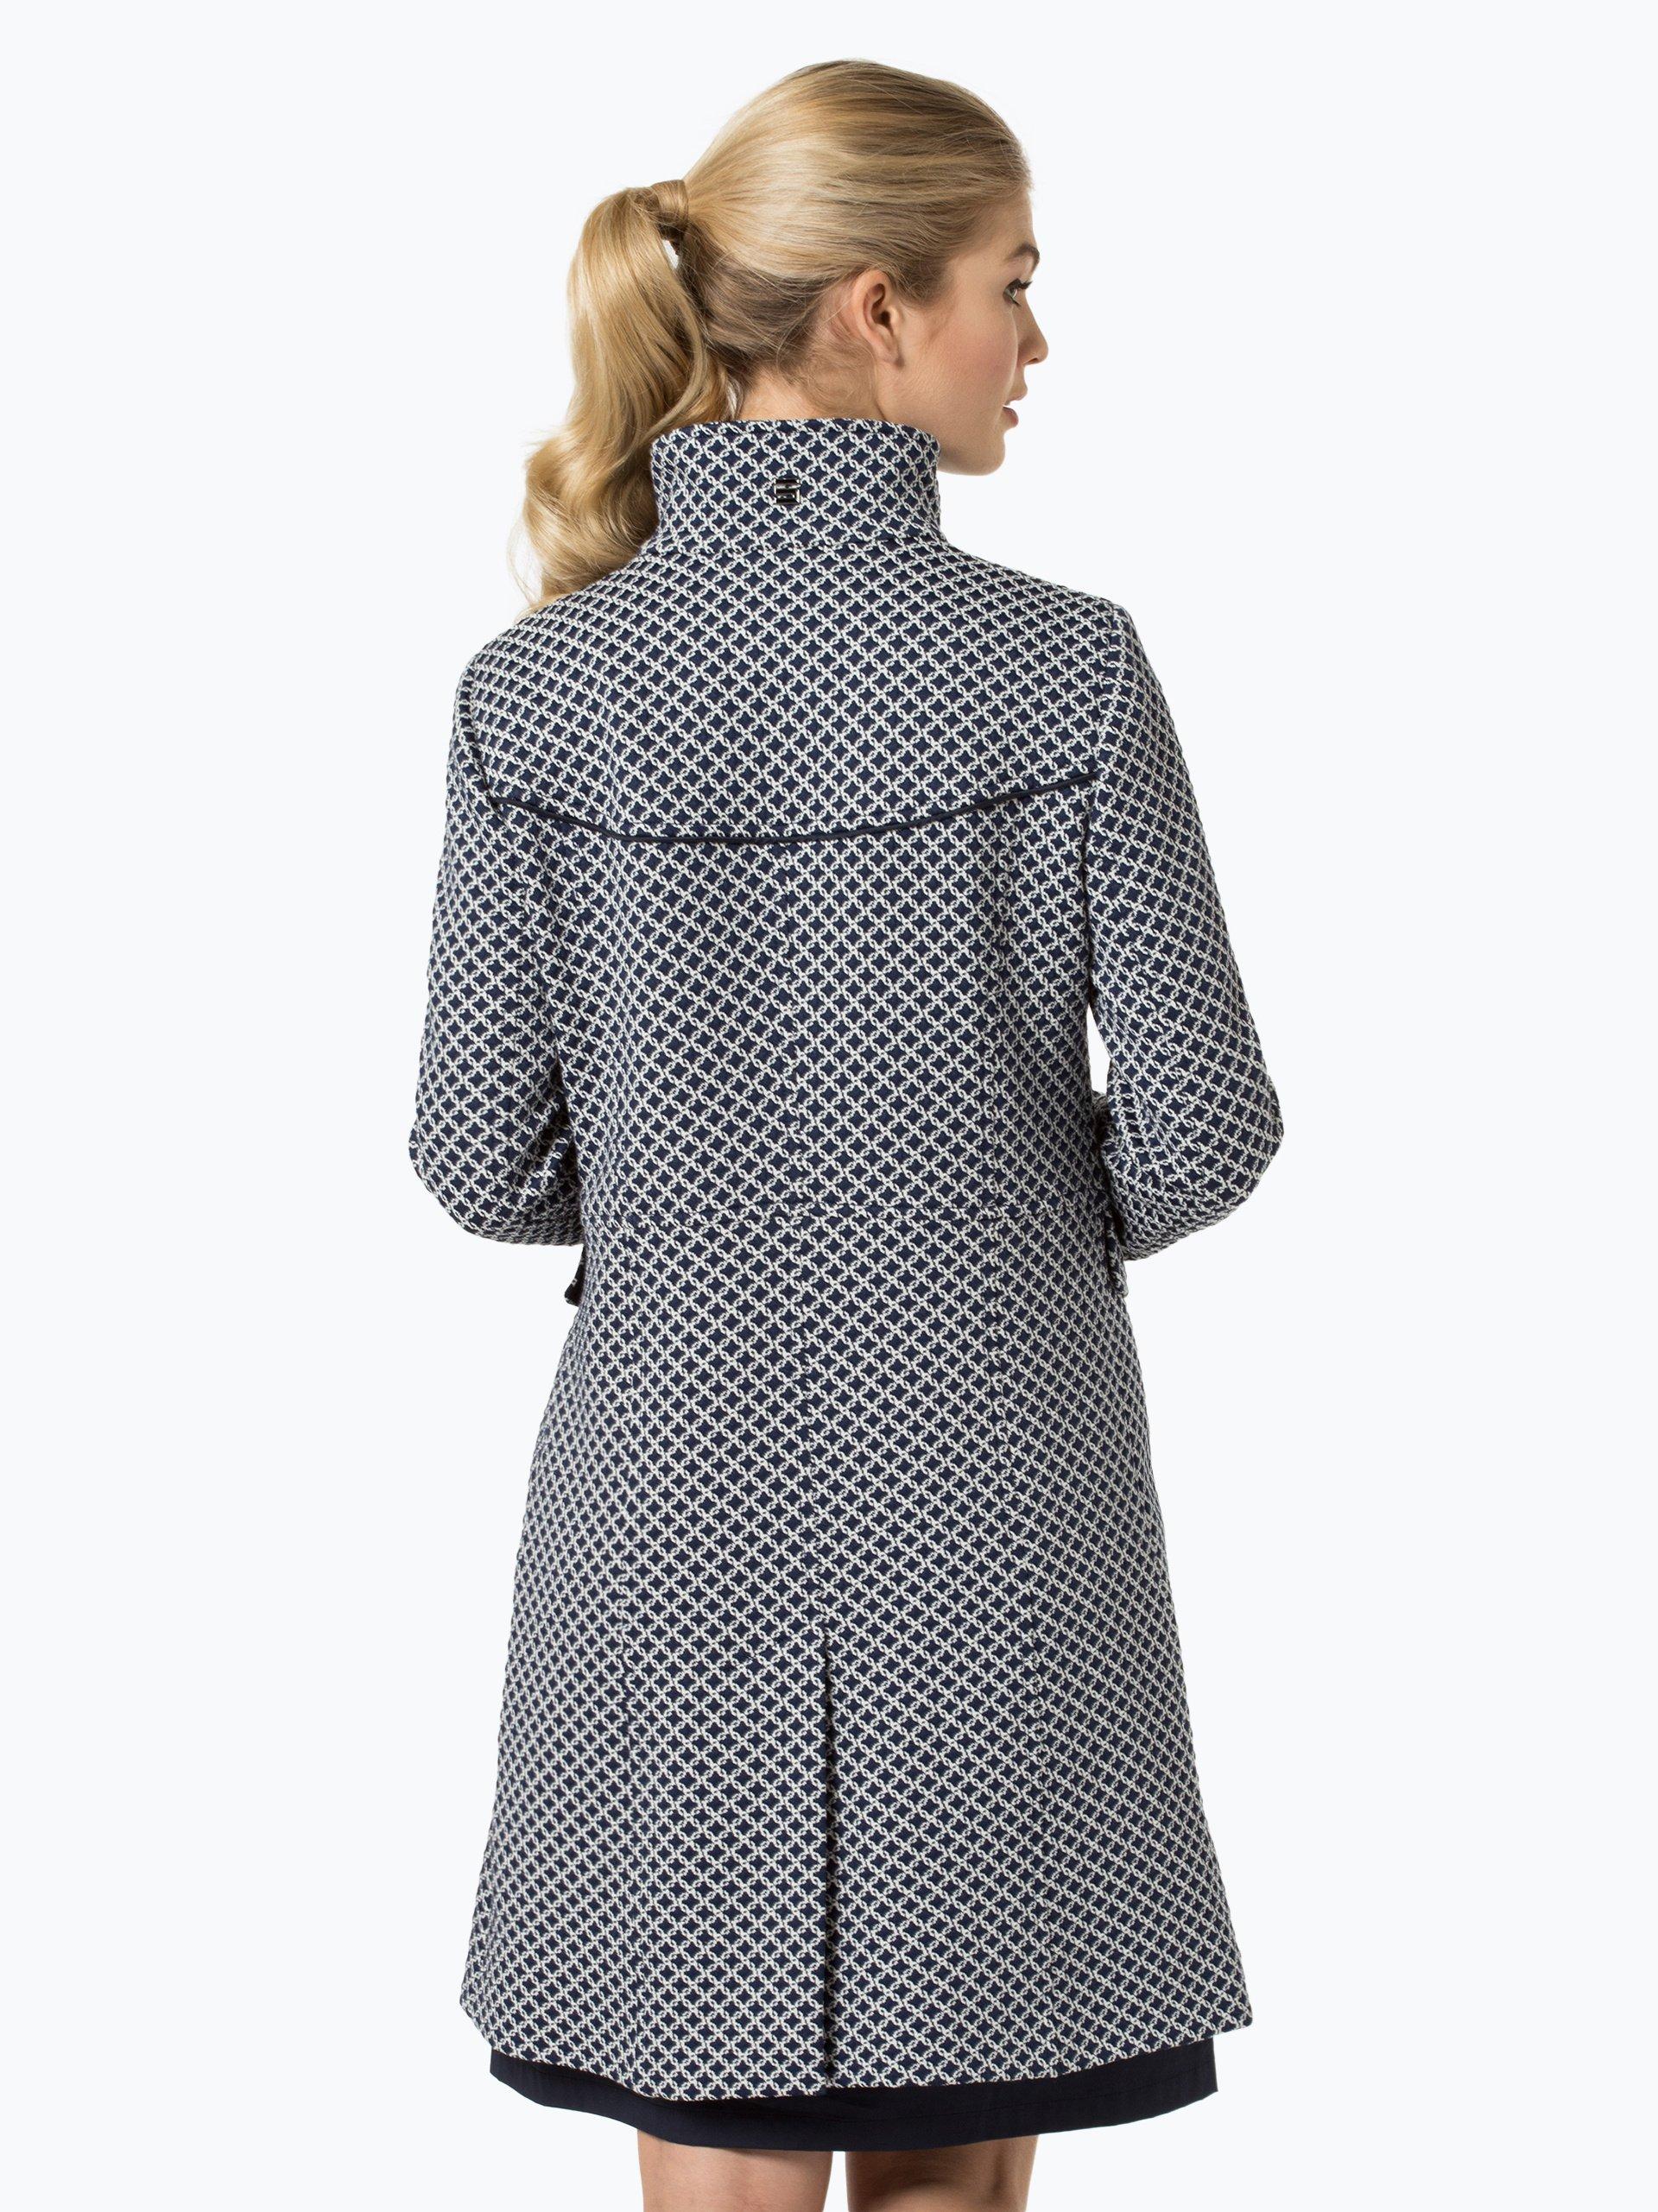 cinque damen mantel cimera blau uni online kaufen peek. Black Bedroom Furniture Sets. Home Design Ideas